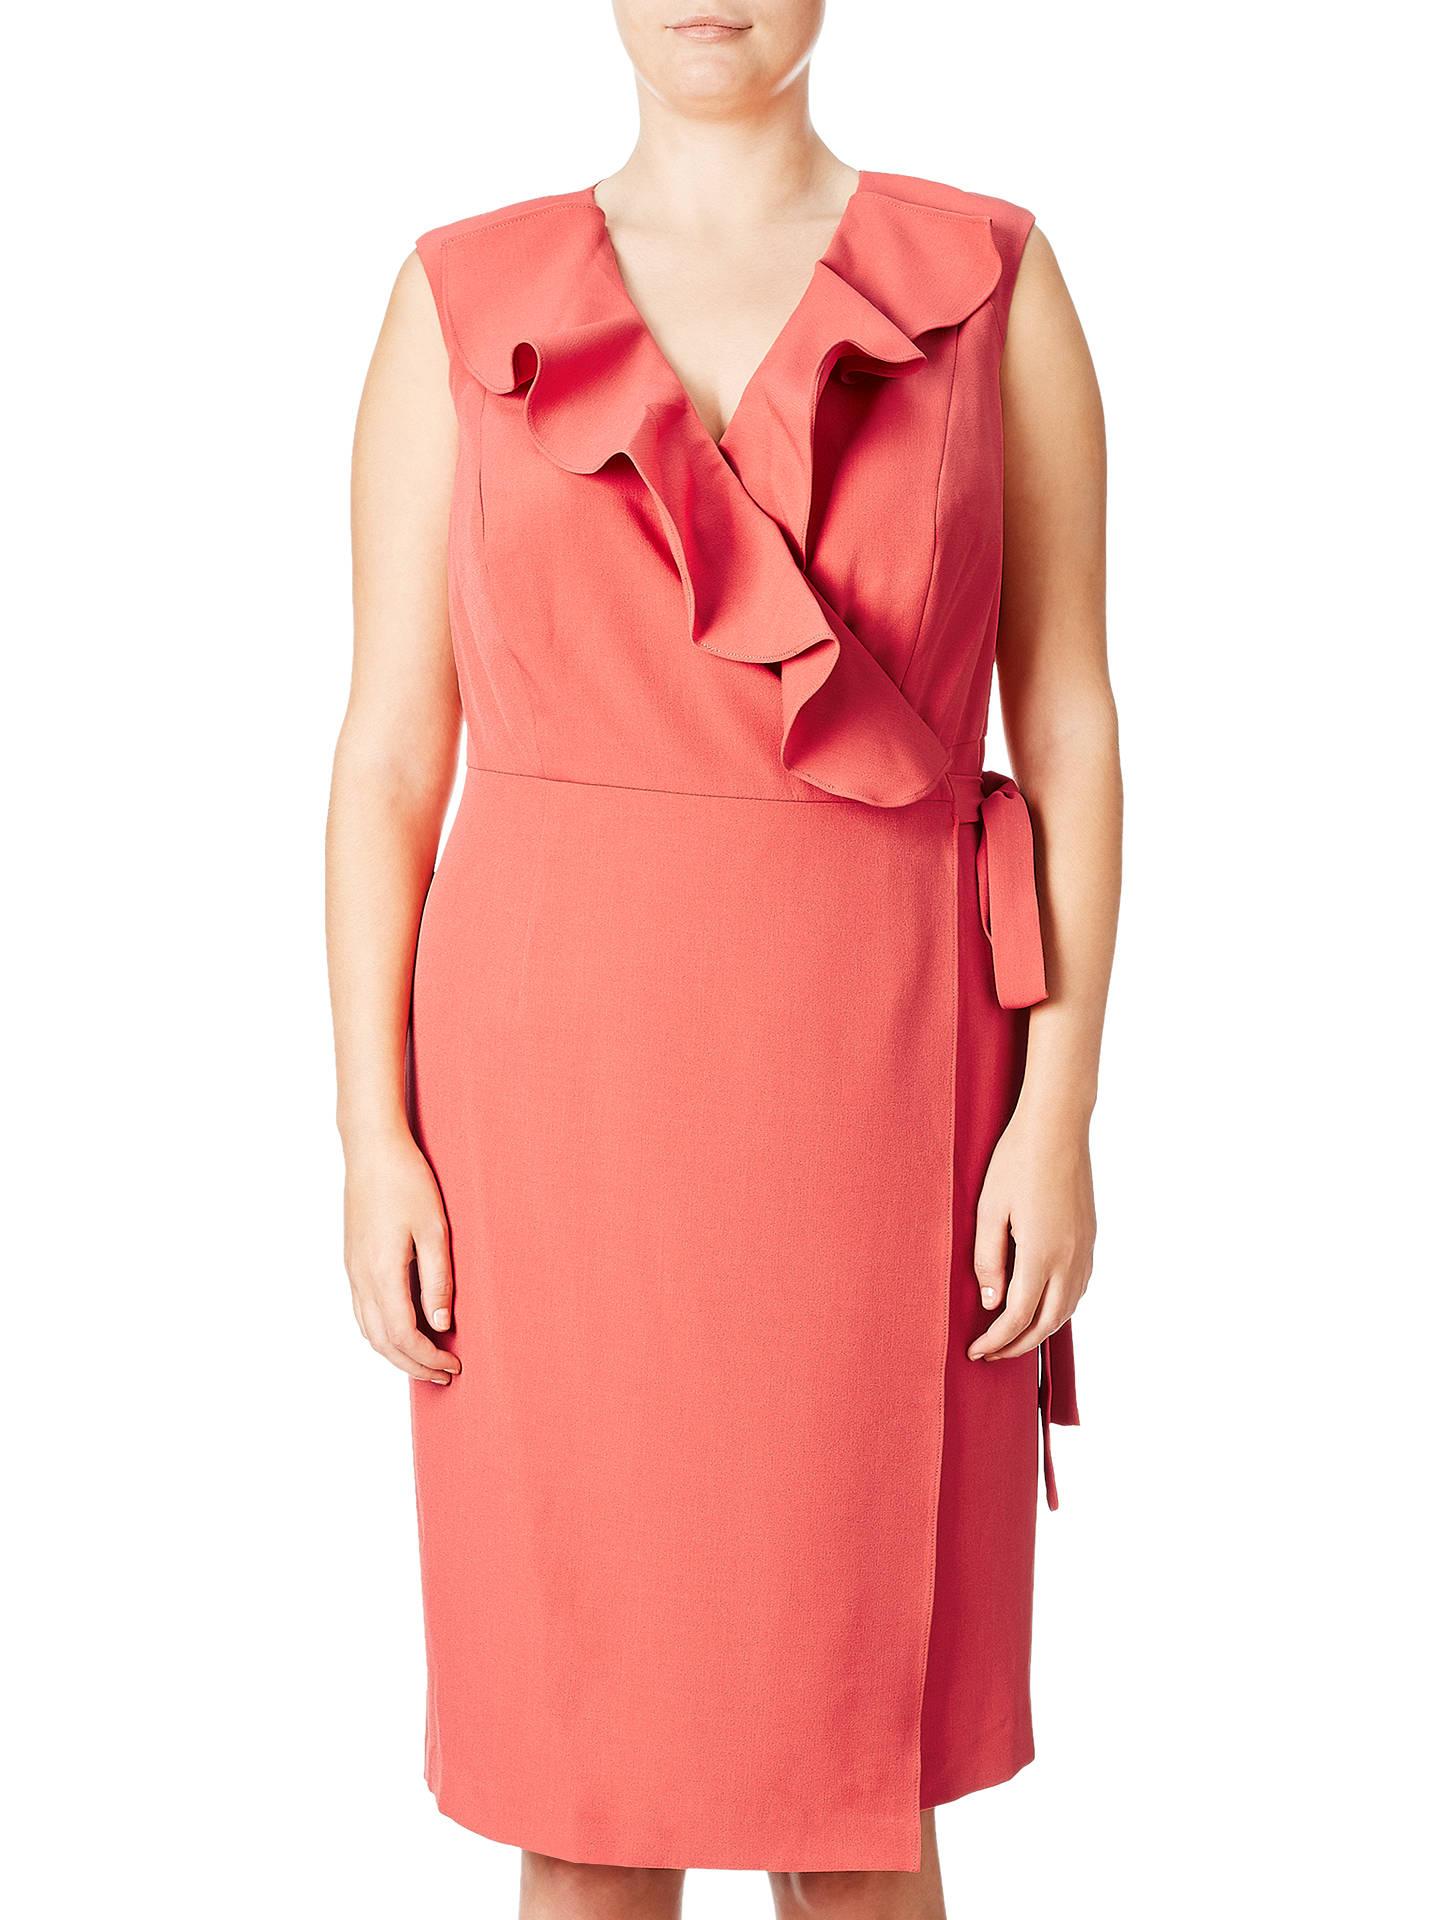 183a8e2891f Adrianna Papell Plus Size Cascading Ruffle Draped Sheath Dress ...